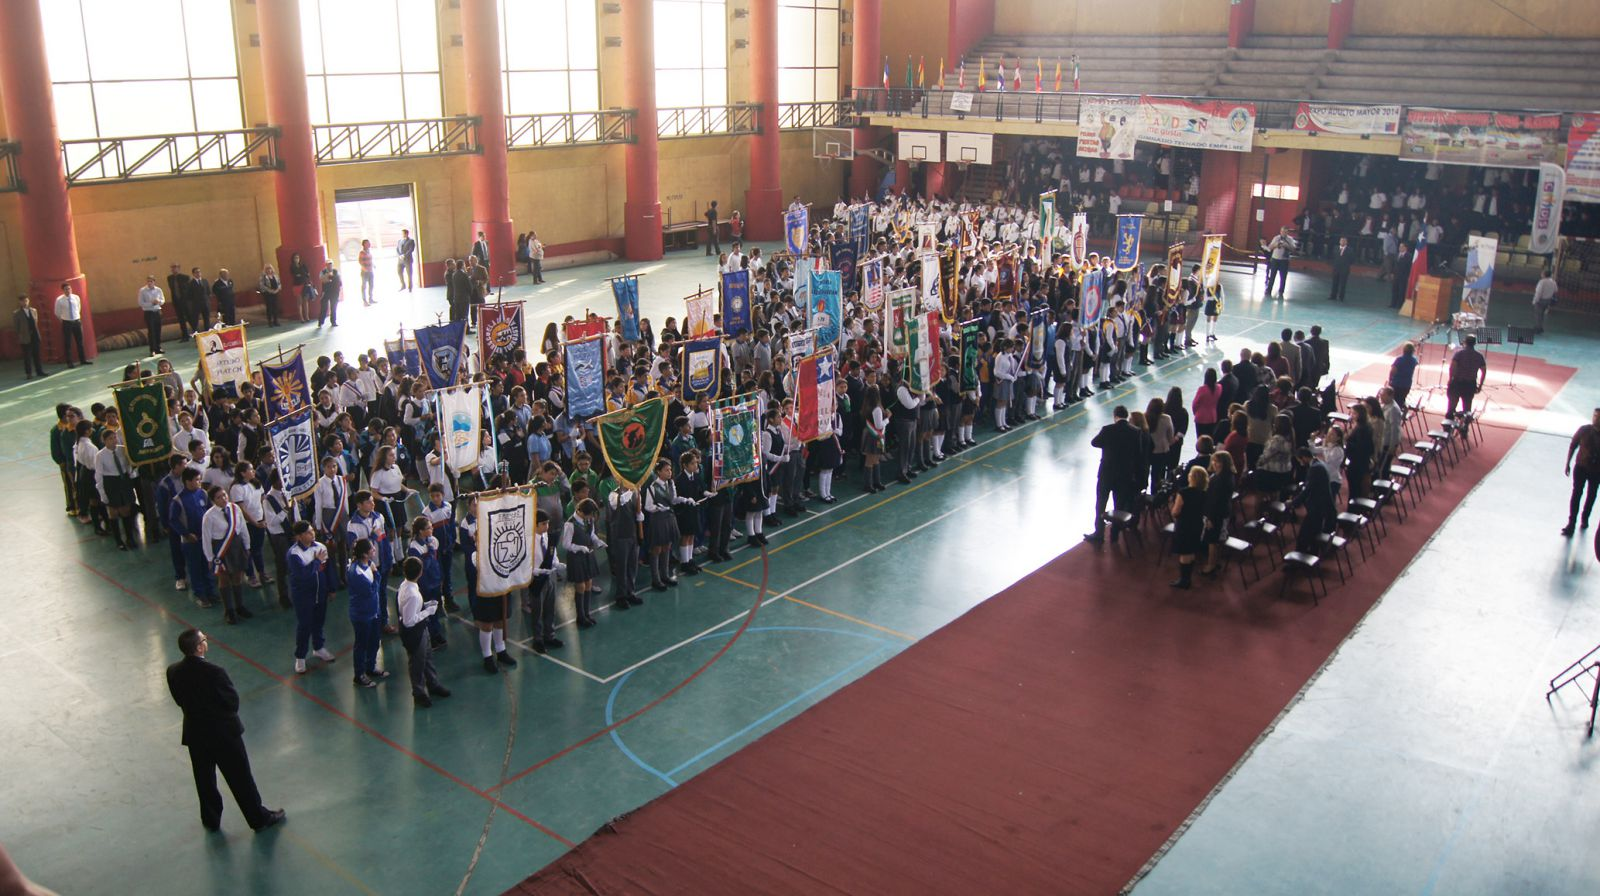 corporacion-municipal-dio-inicio-a-actividades-extraescolares-para-mas-de-15-mil-estudiantes